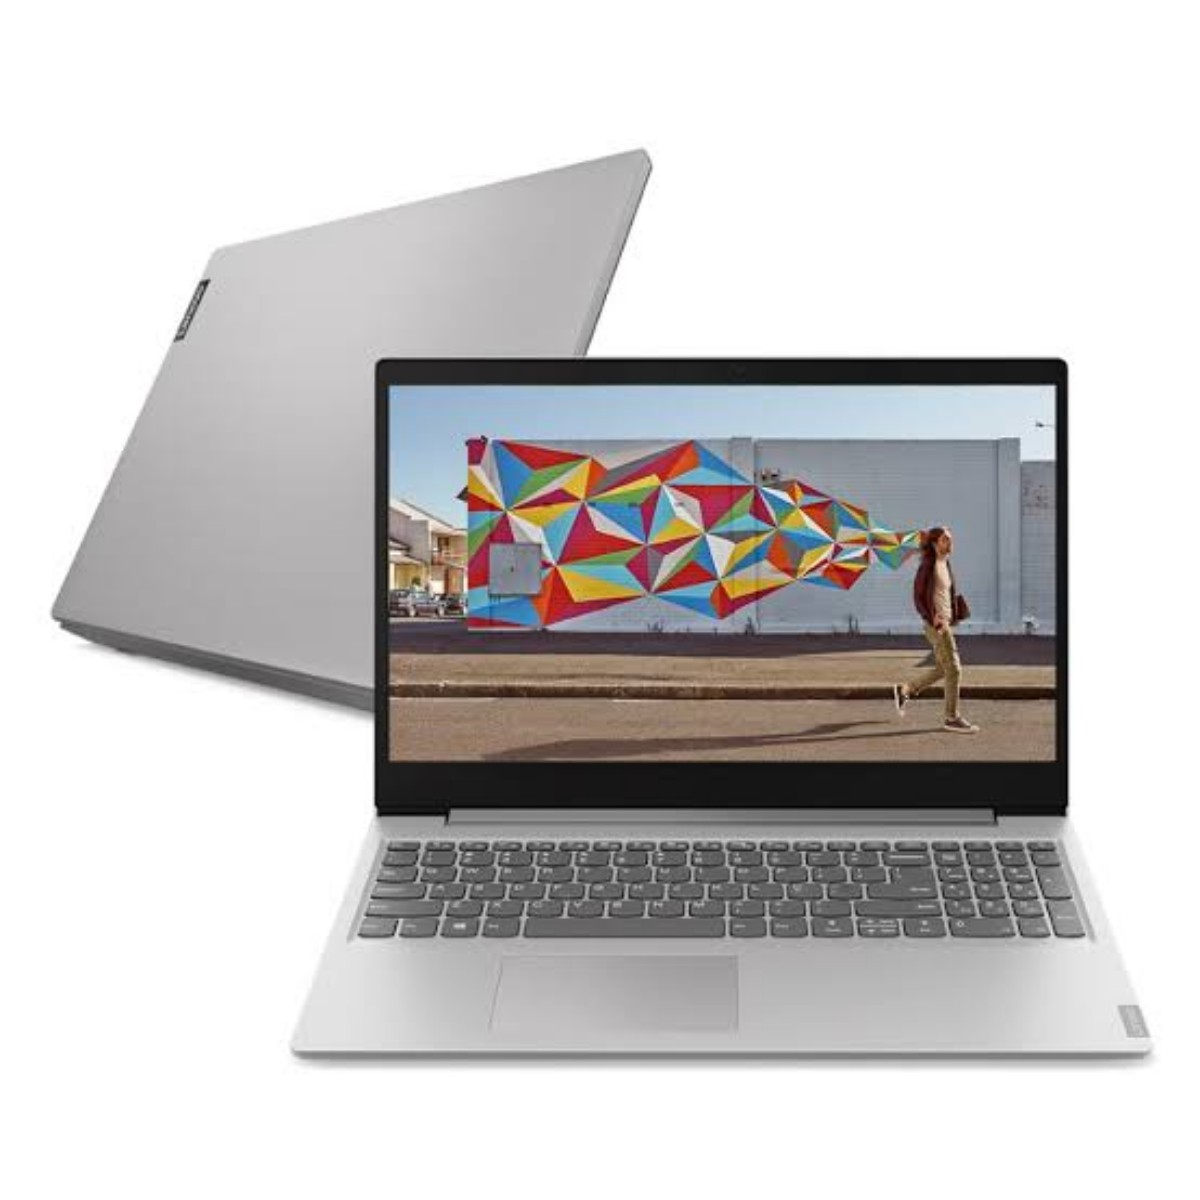 Imagem do notebook modelo Lenovo Ideapad S145